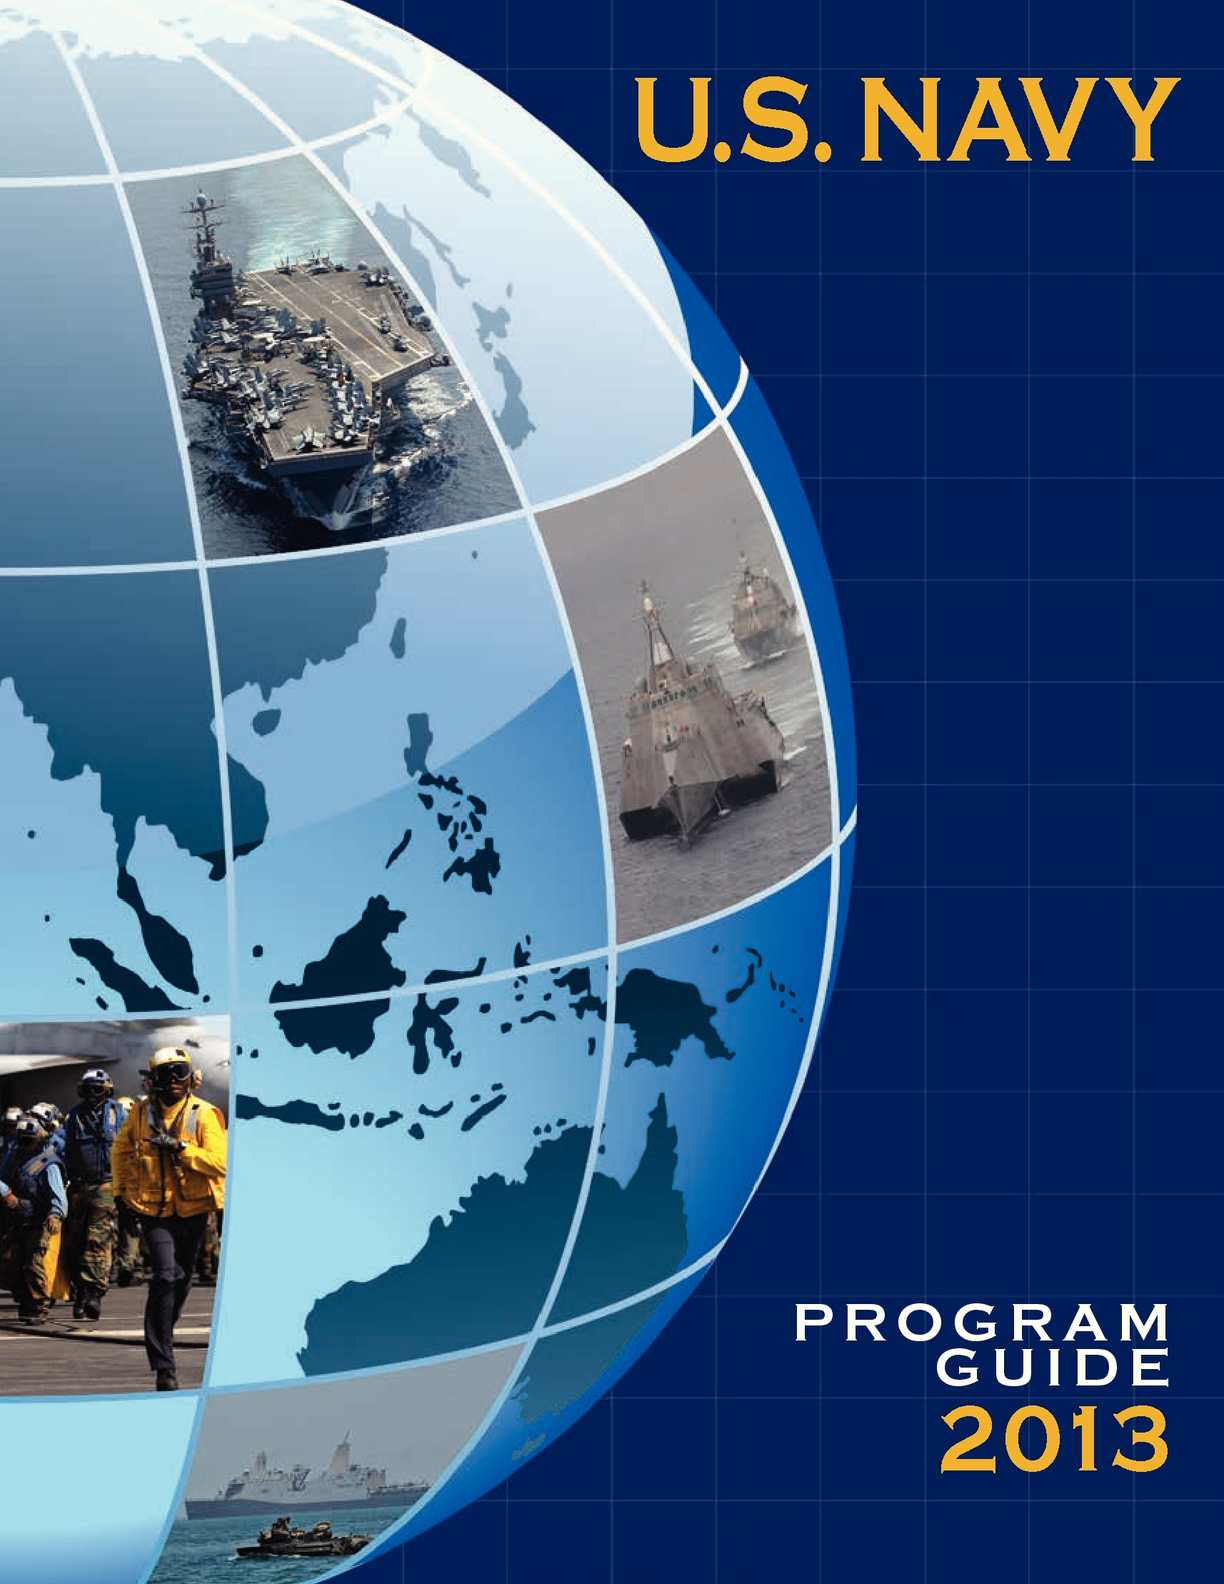 Calam O US NAVY Programm Guide 2013